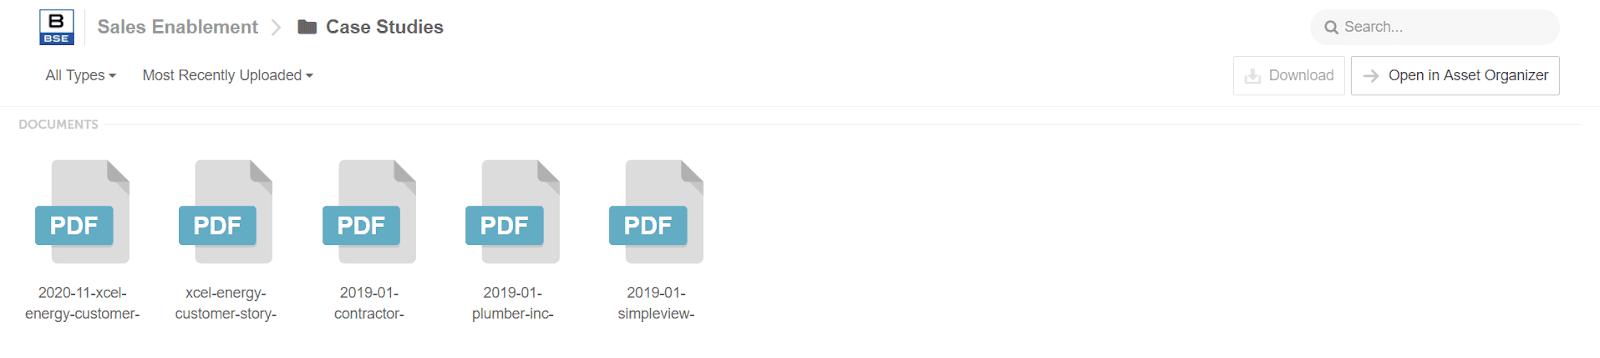 A single internal team folder in asset organizer with PDF files